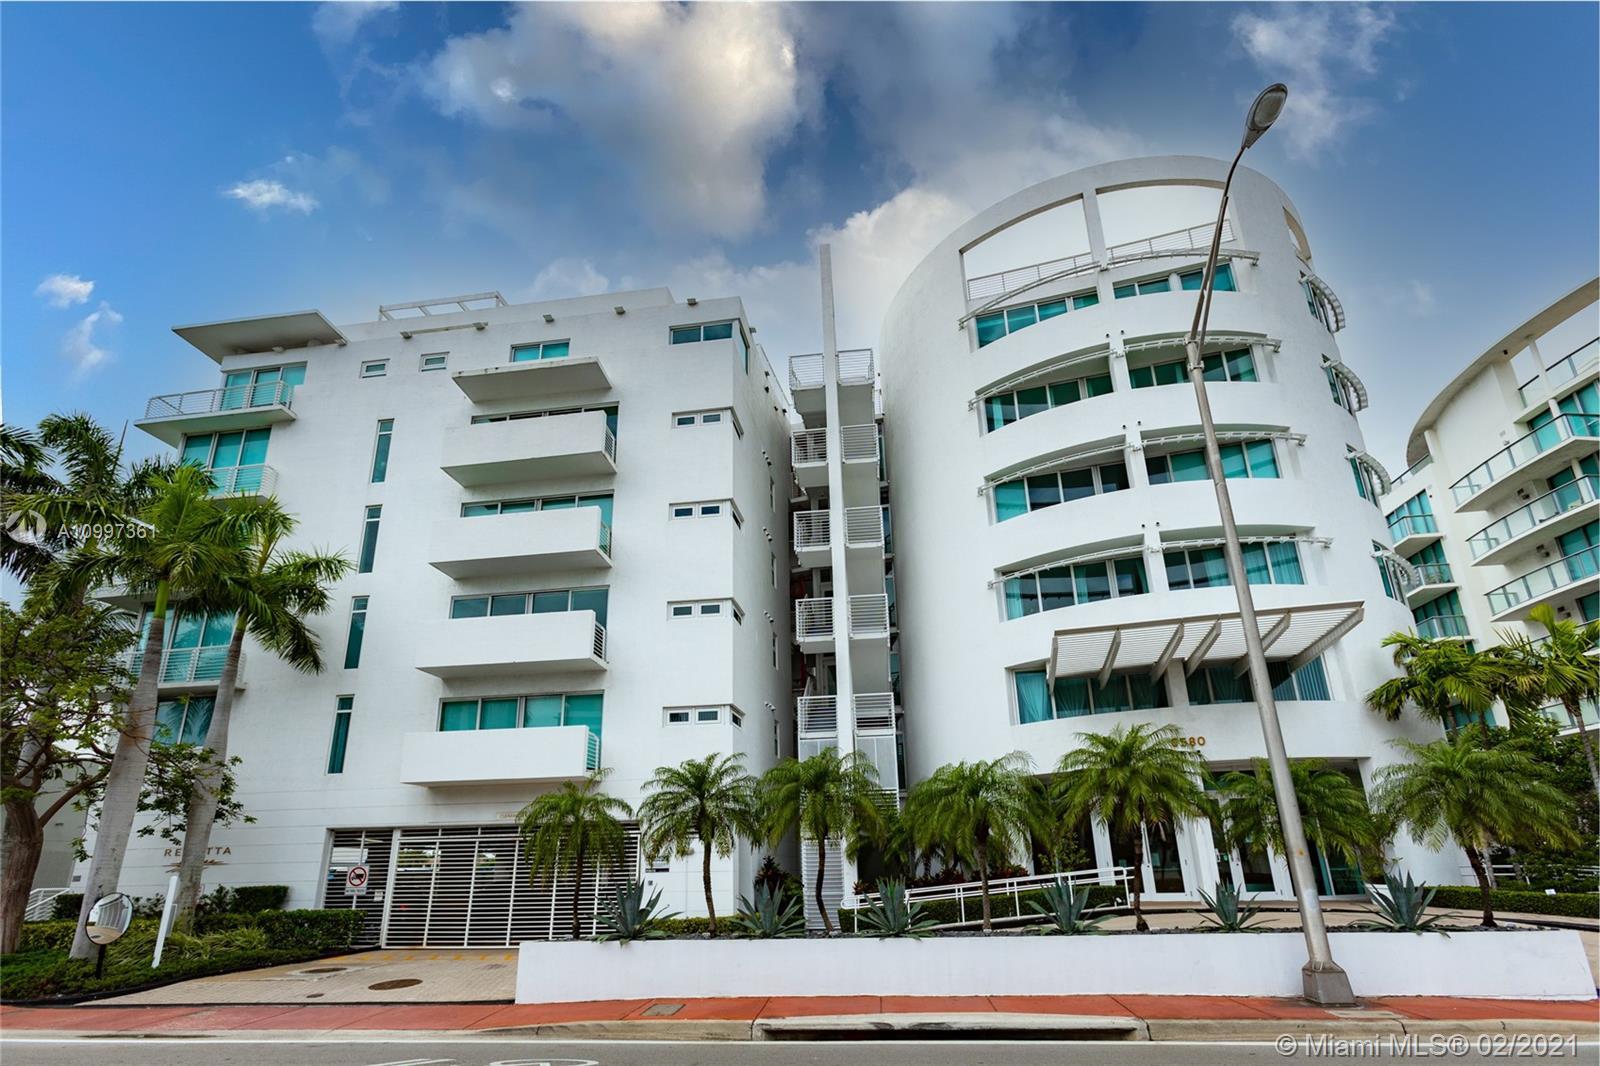 Regatta #303 - 6580 Indian Creek Dr #303, Miami Beach, FL 33141